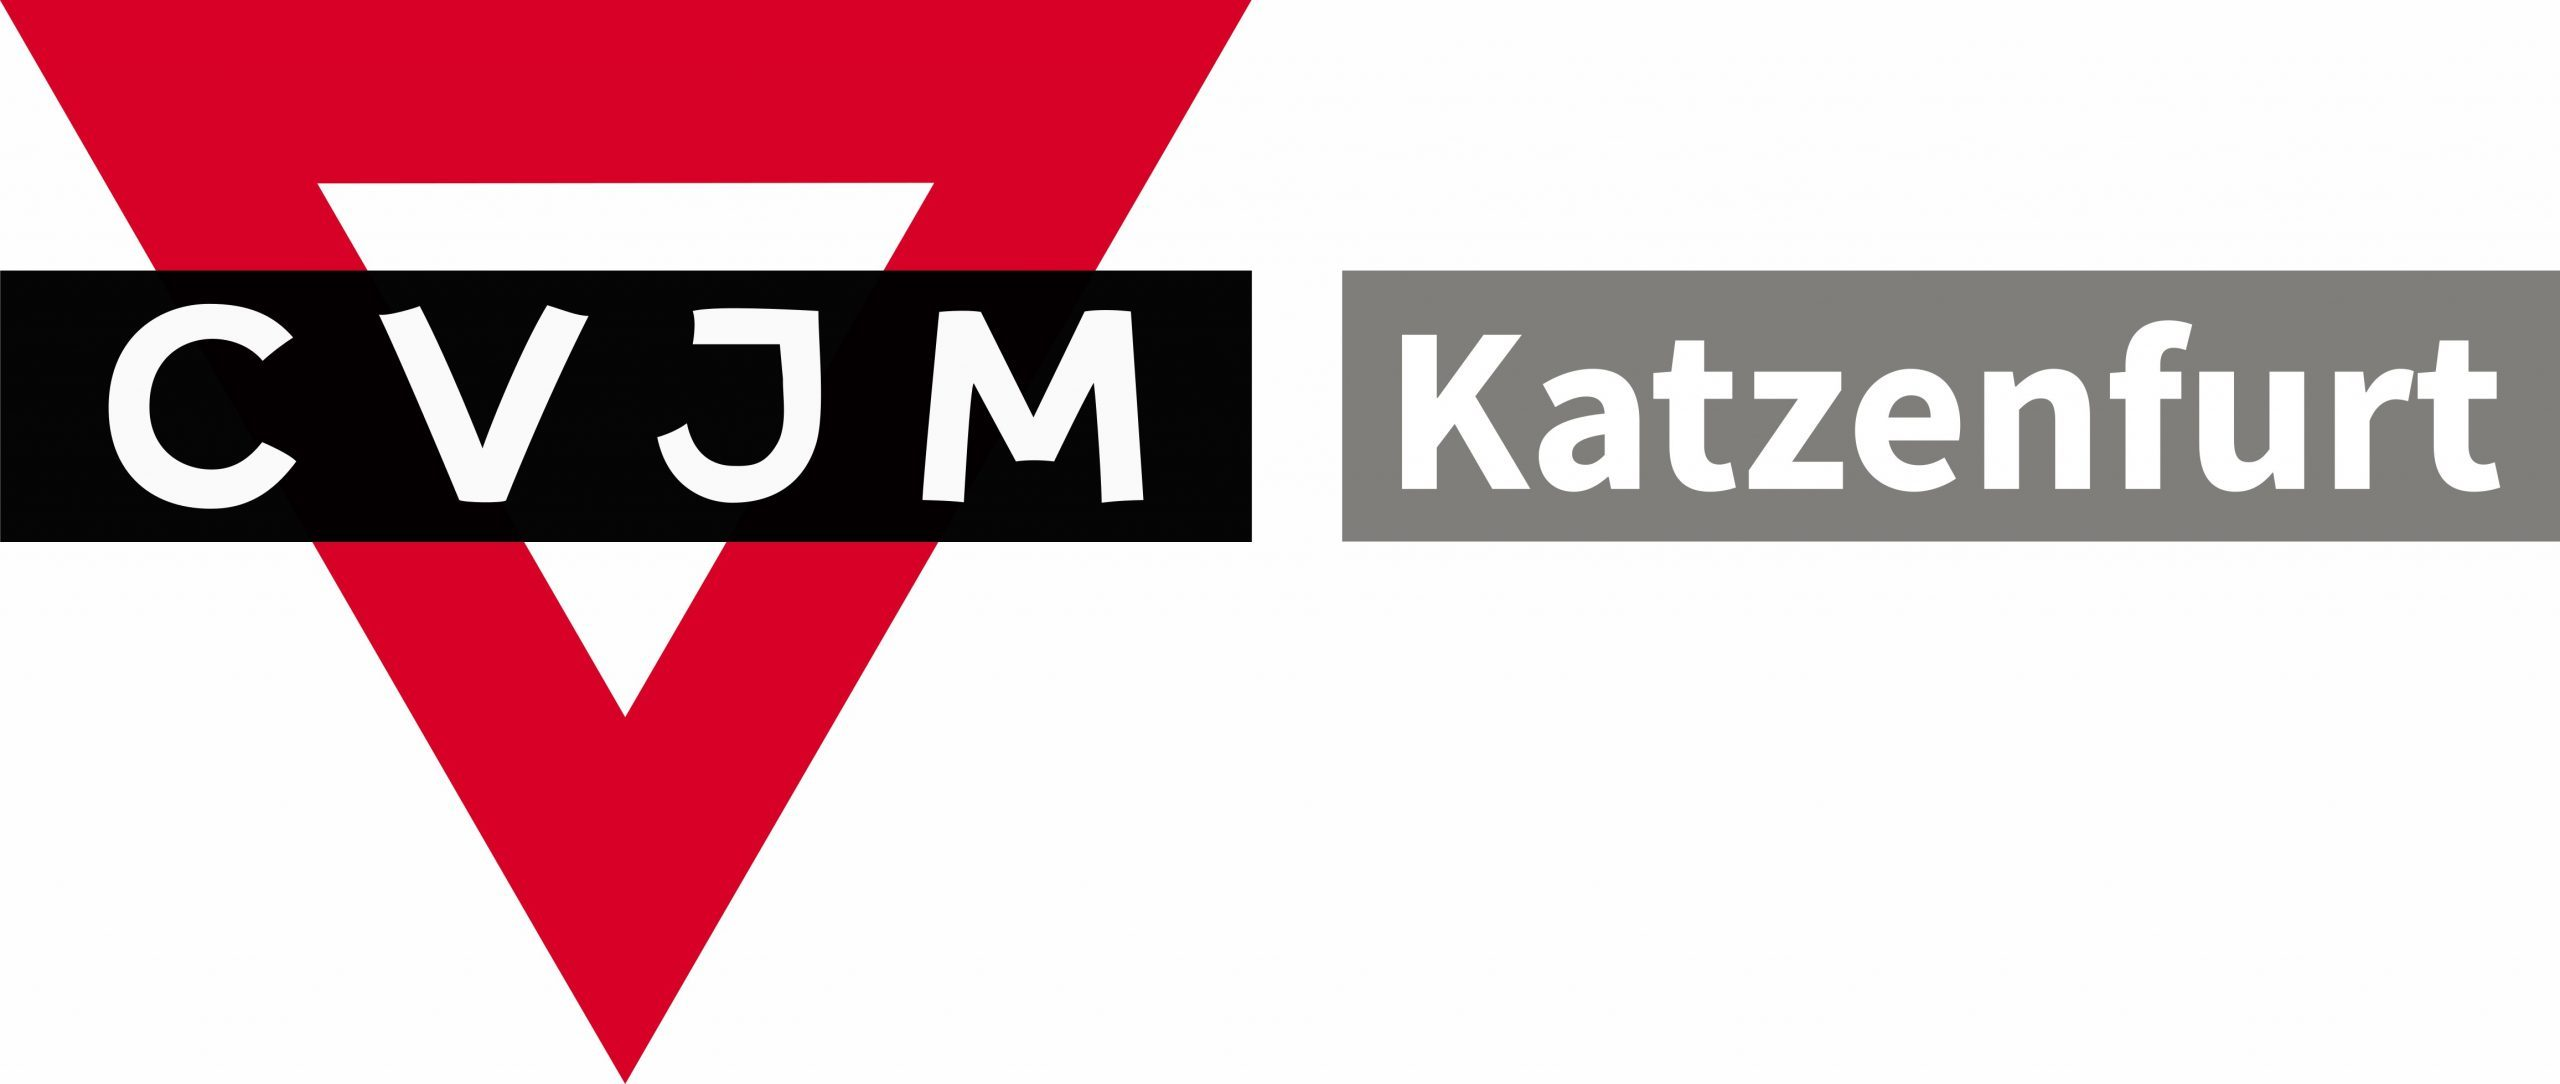 CVJM Katzenfurt